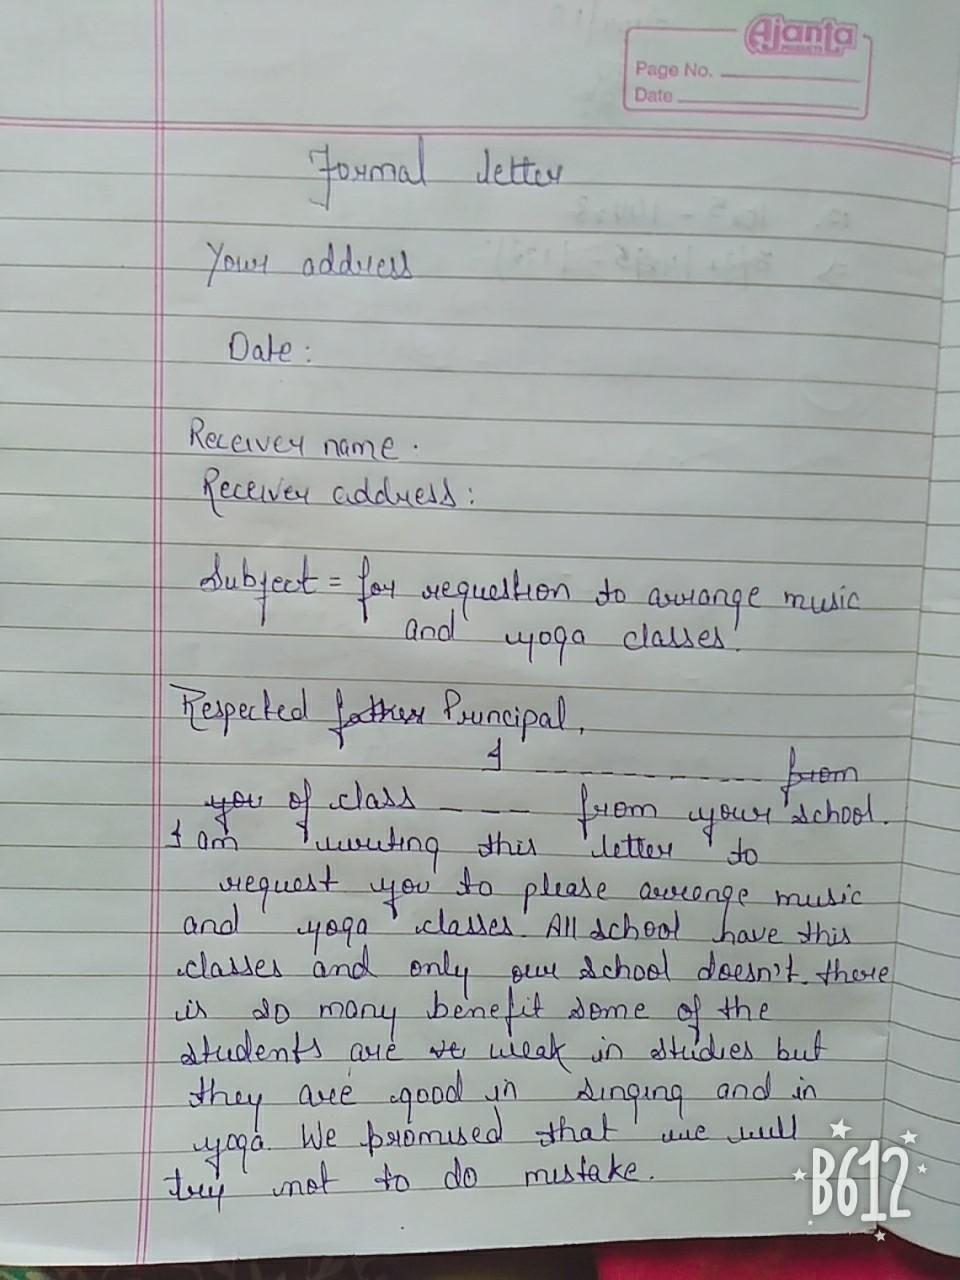 to the principal application